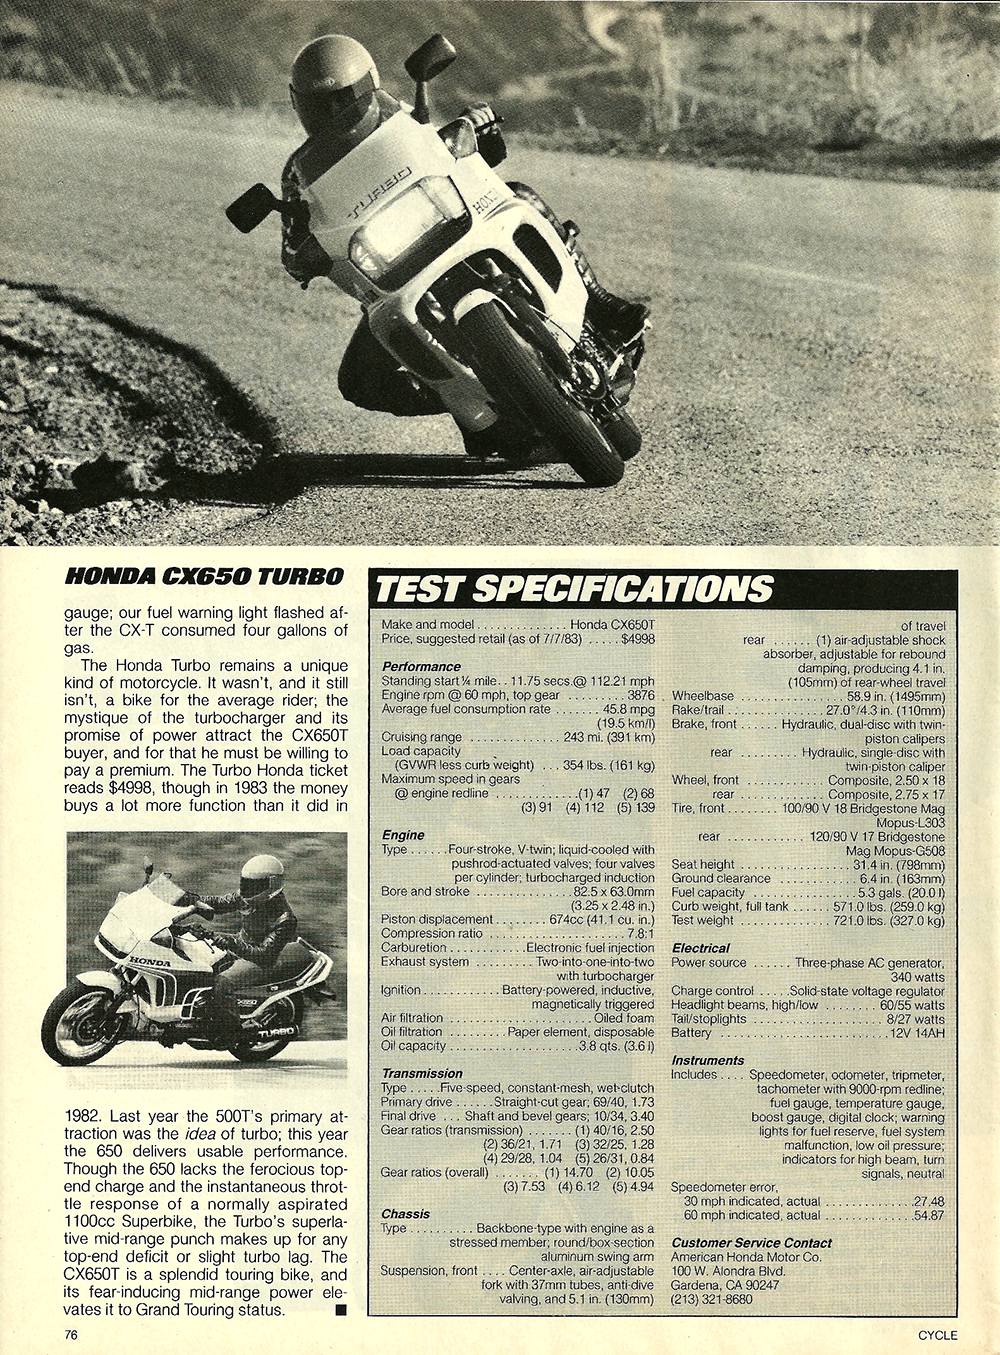 1983 Honda CX650 Turbo road test — Ye Olde Cycle Shoppe